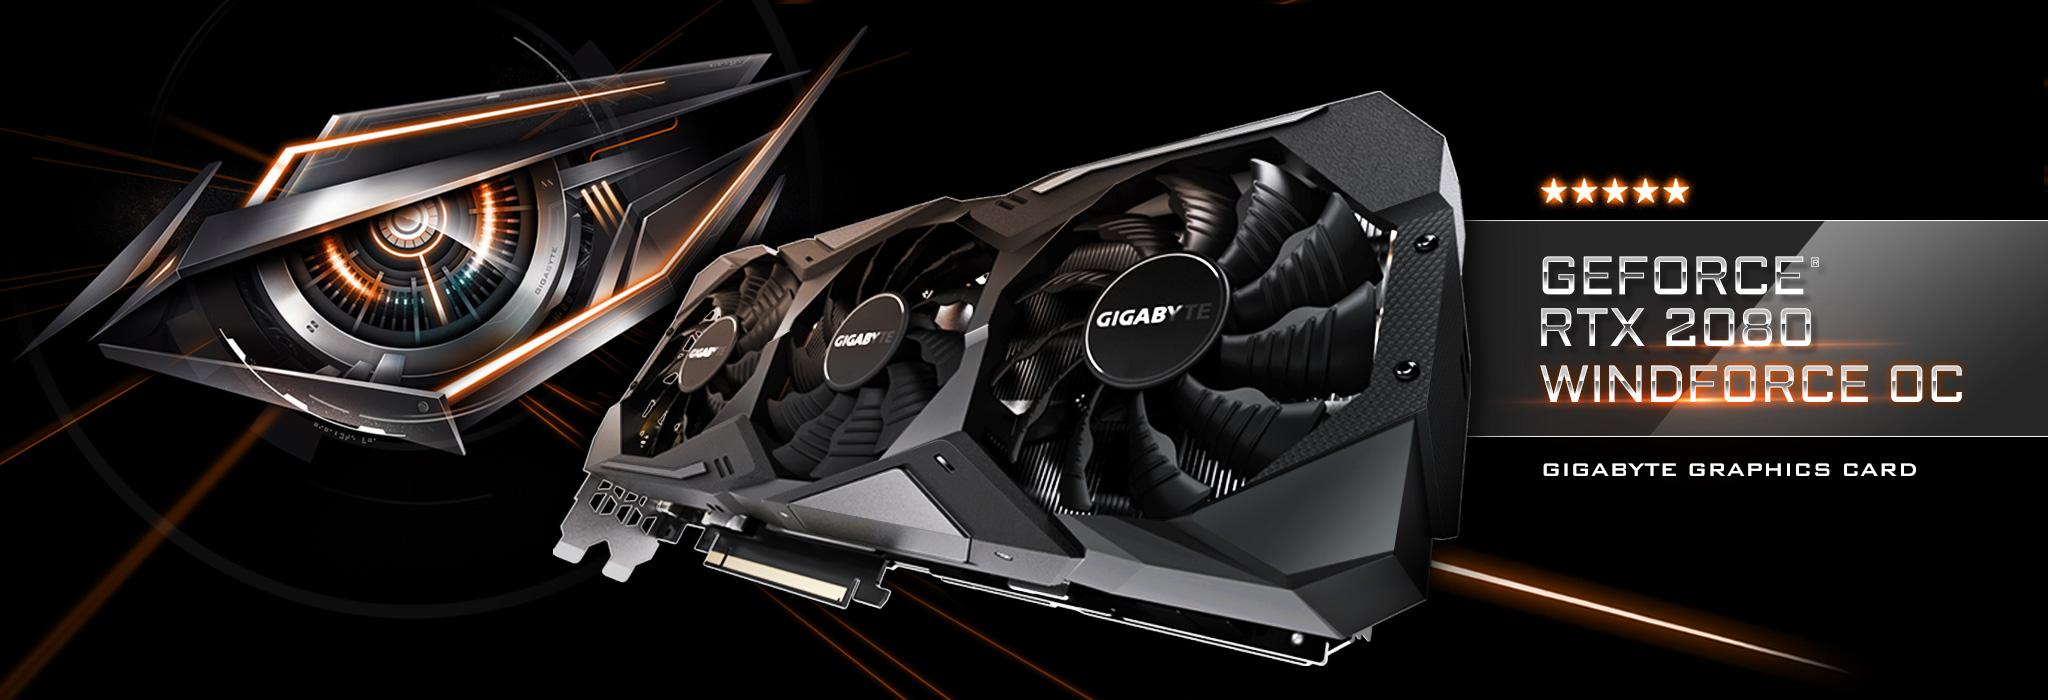 GeForce RTX™ 2080 WINDFORCE OC 8G | Graphics Card - GIGABYTE